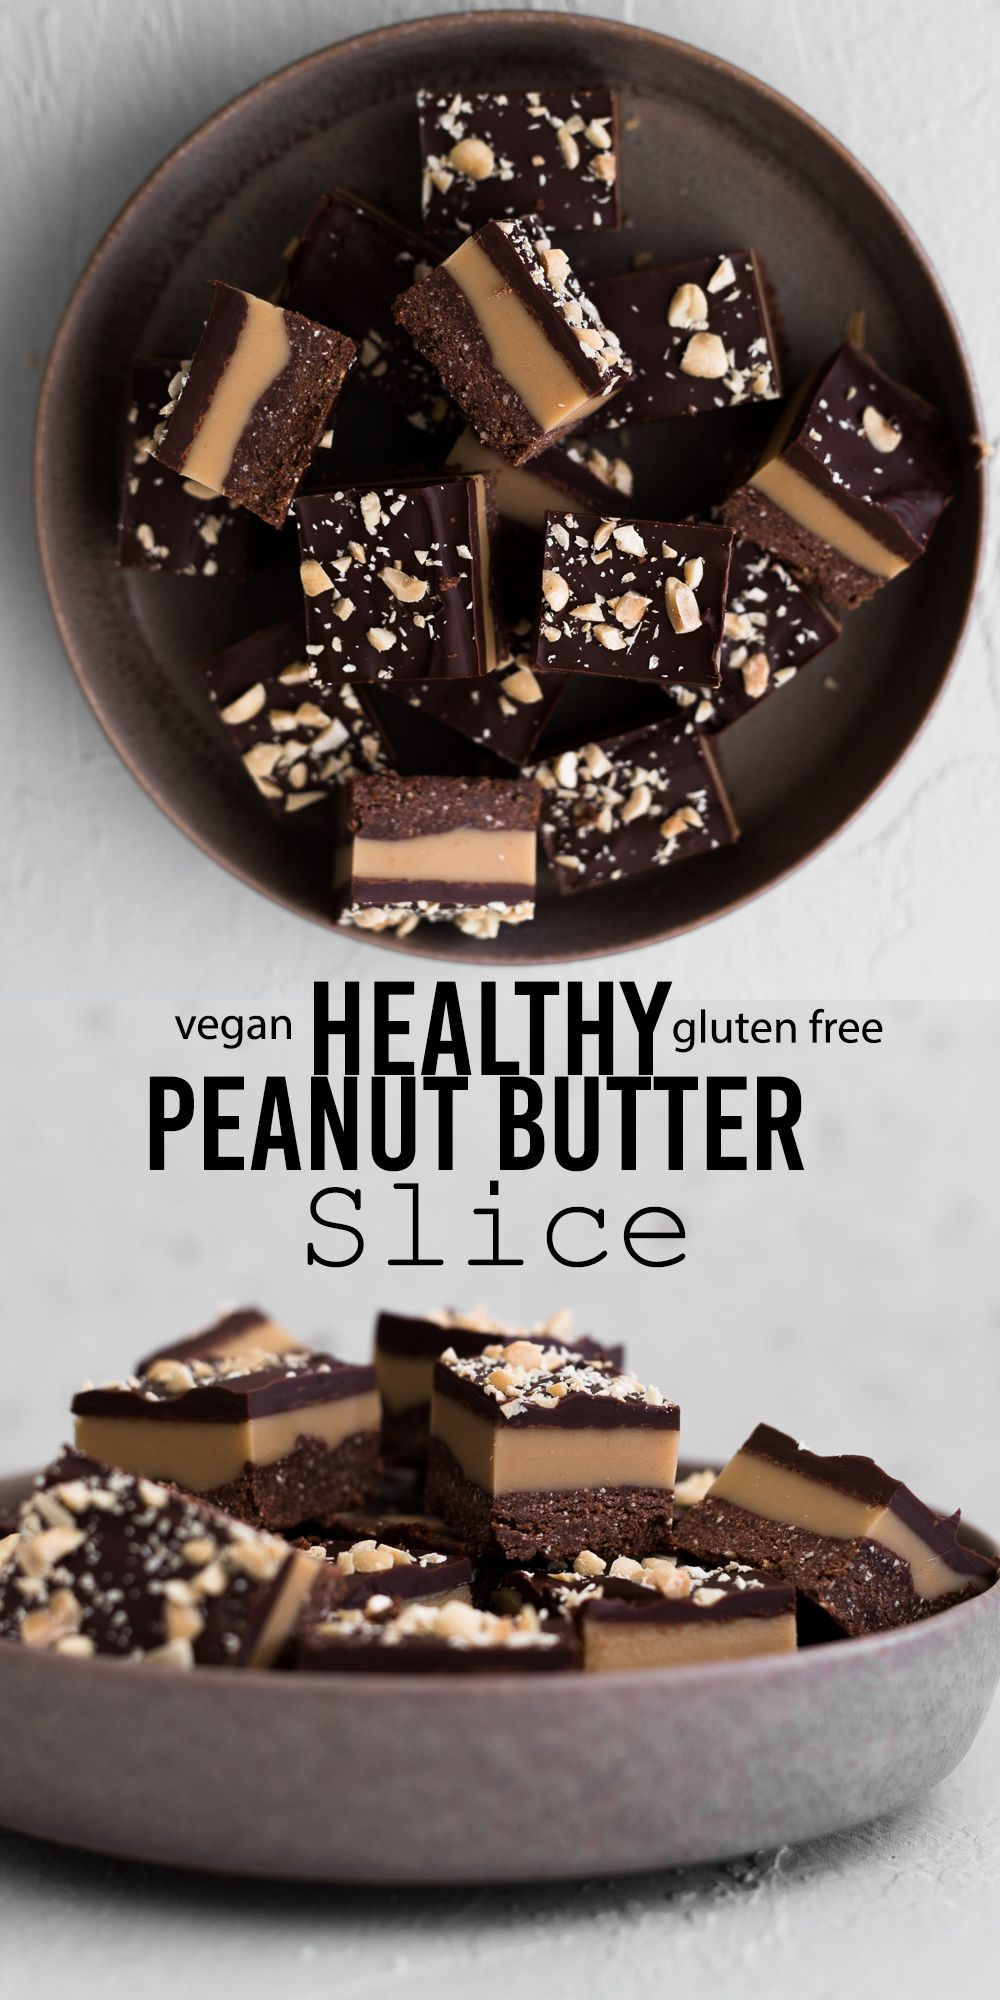 Healthy Vegan Peanut Butter Slice A delicious no-bake Vegan Peanut Butter Slice made with Desiccate